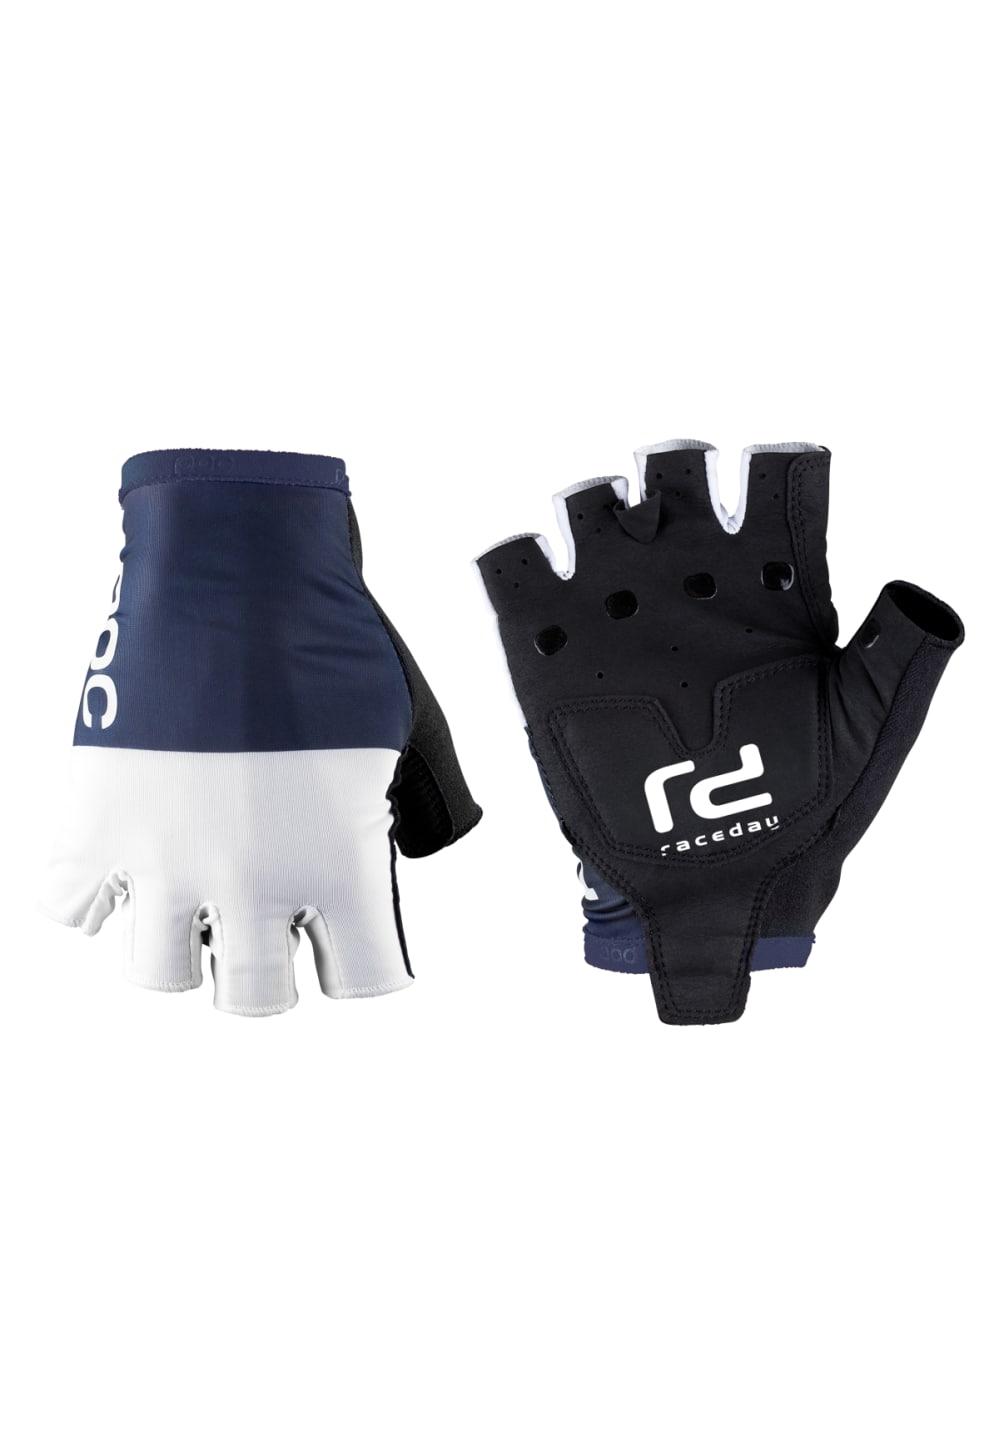 POC Raceday Glove Radhandschuhe - Blau, Gr. S